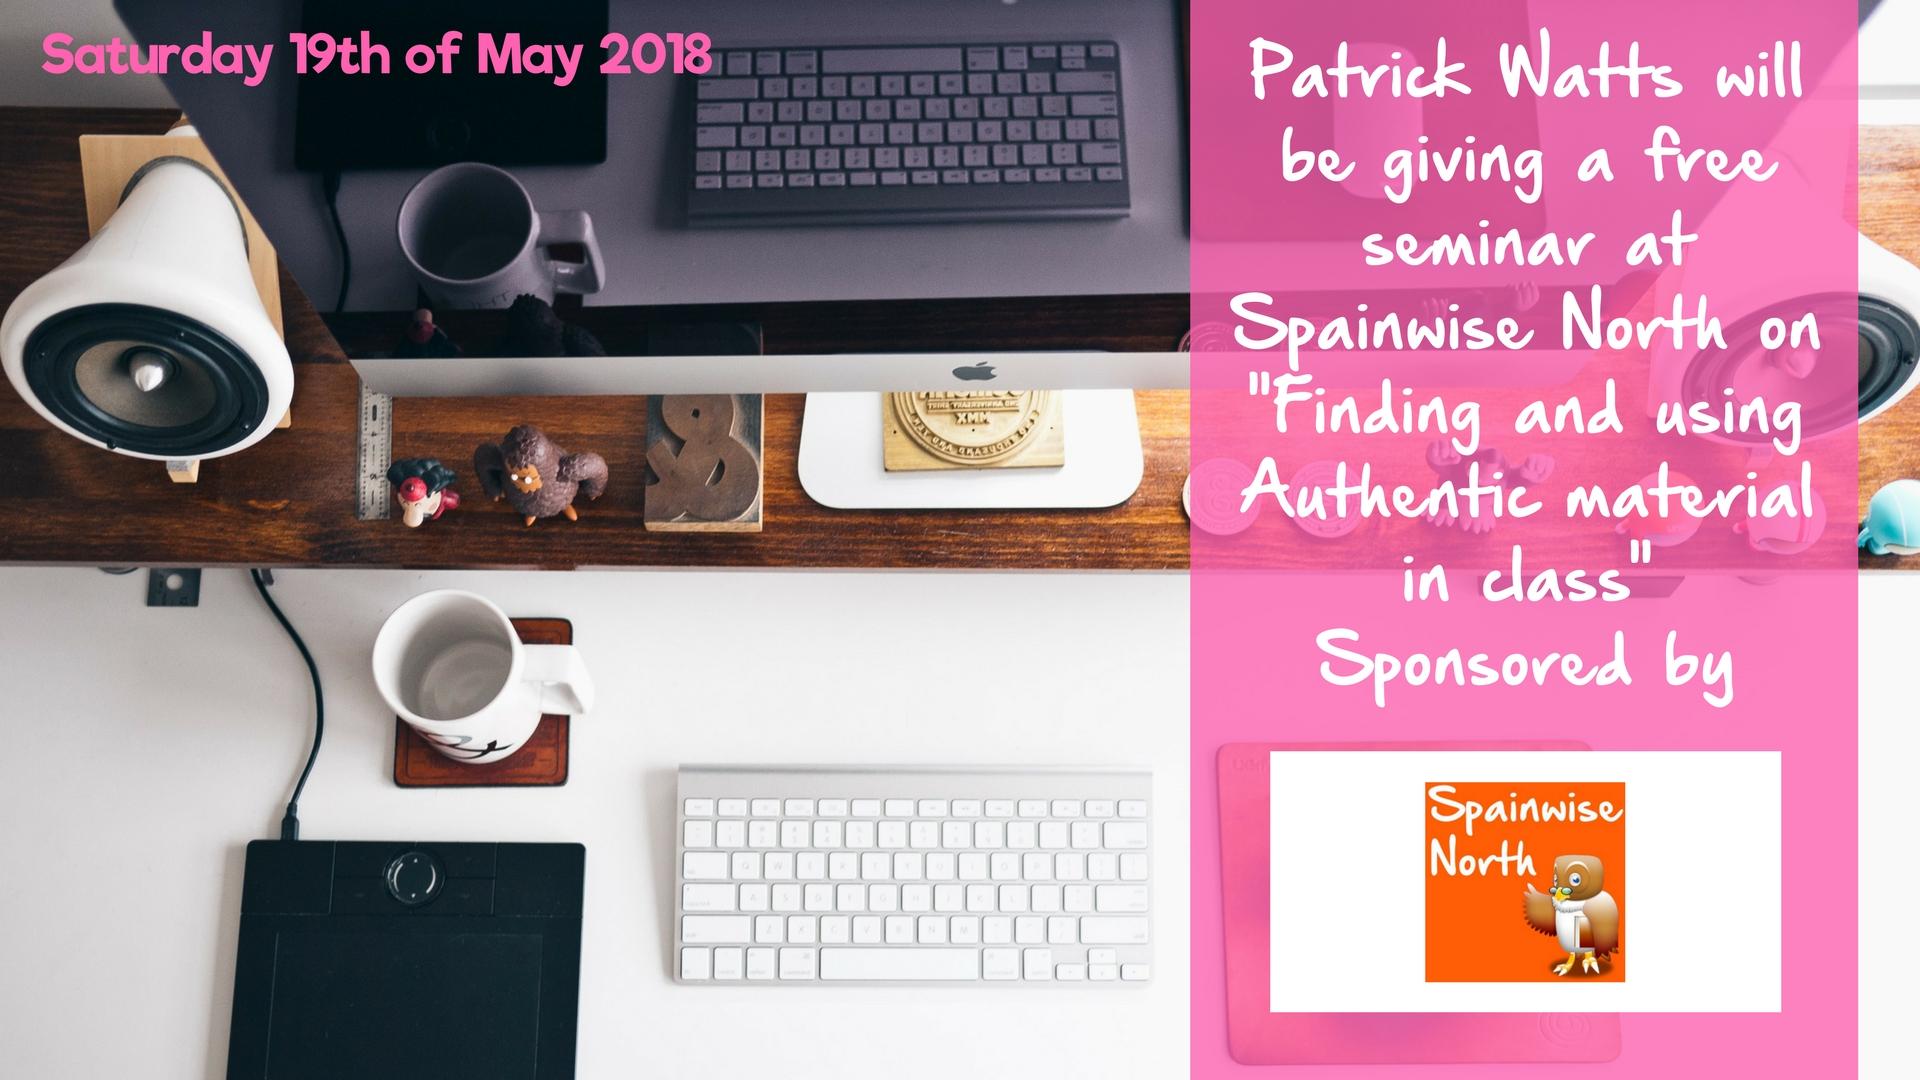 Spainwise North Seminars